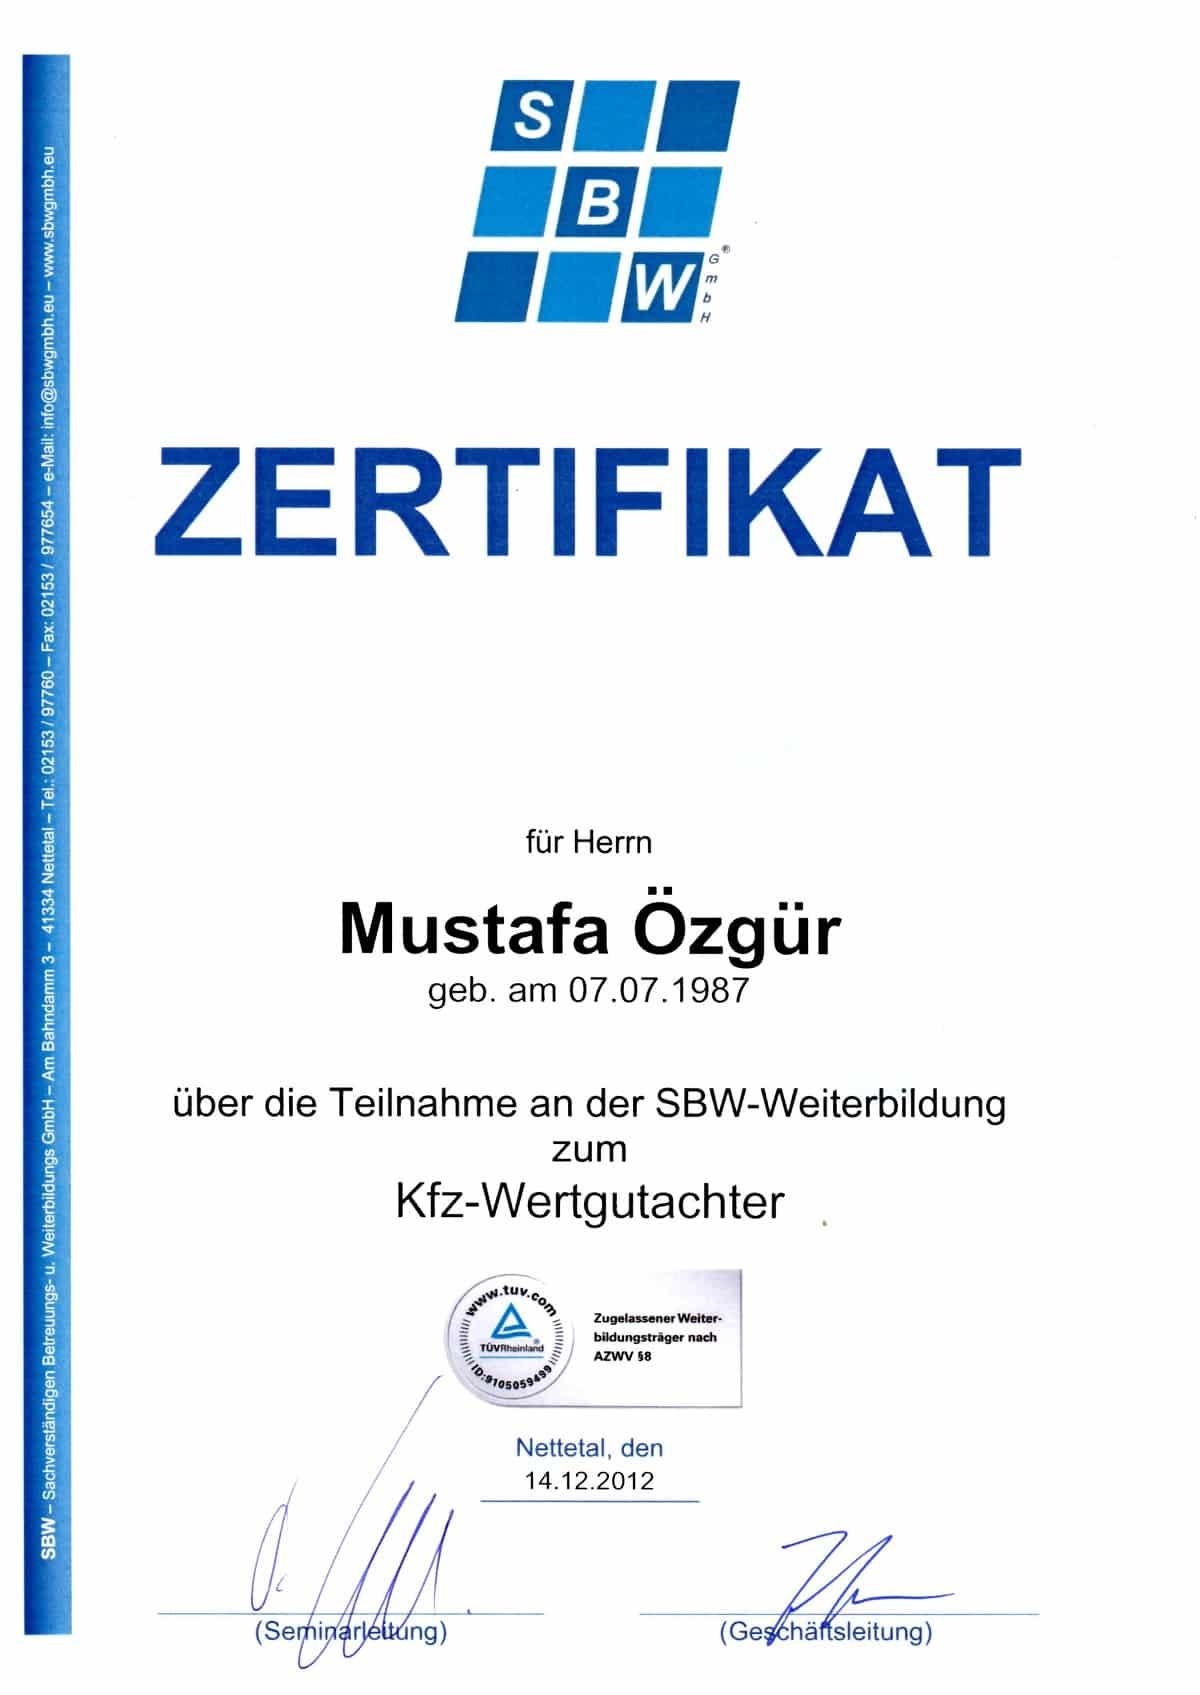 KFZ Wertgutachten Zertifikat Mustafa Özgür